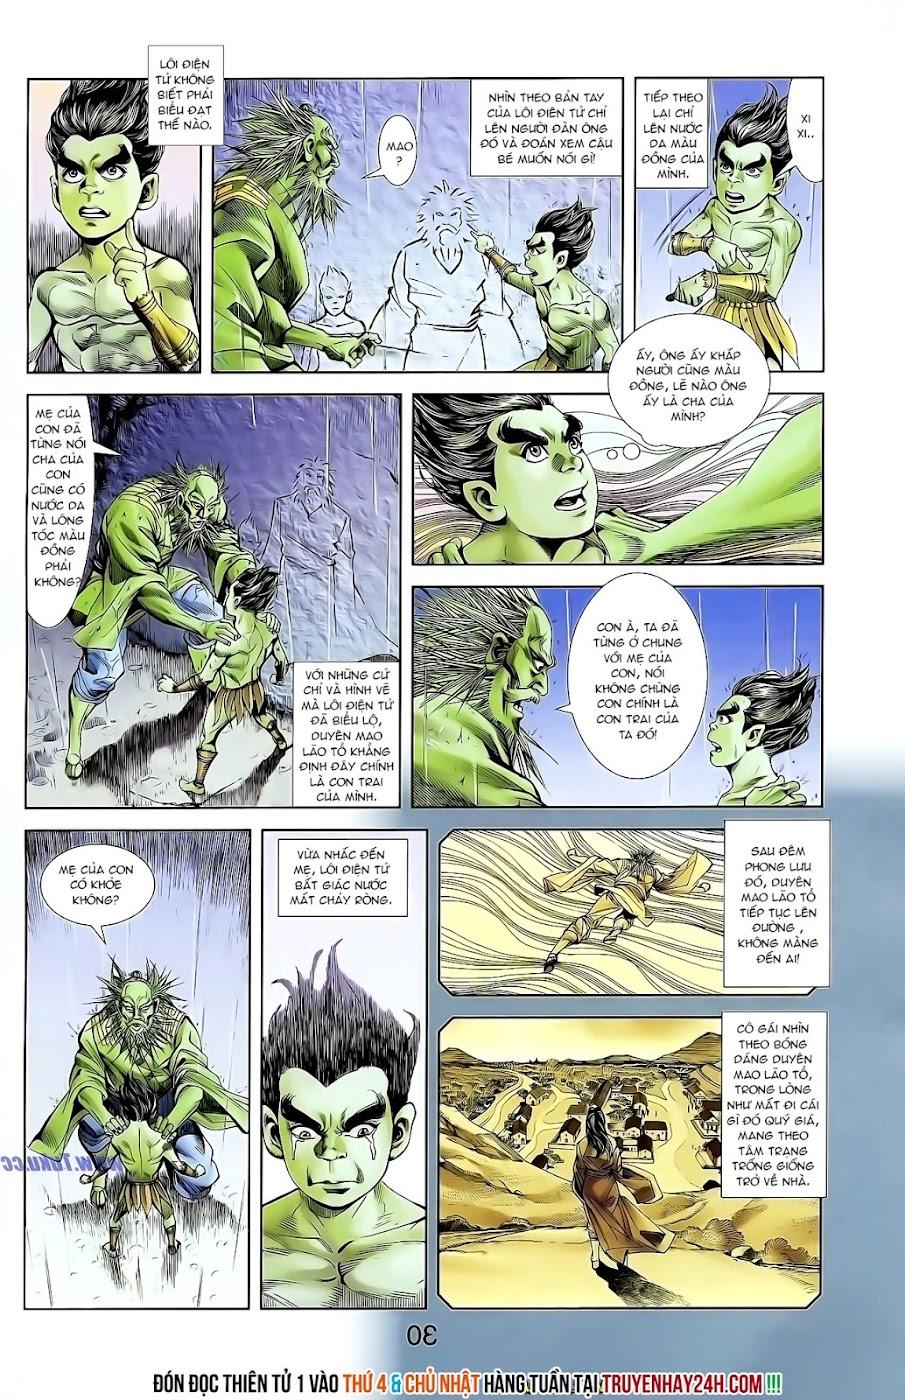 Thiên Tử Truyền Kỳ P1 Chap 129 - Next Chap 130 image 26